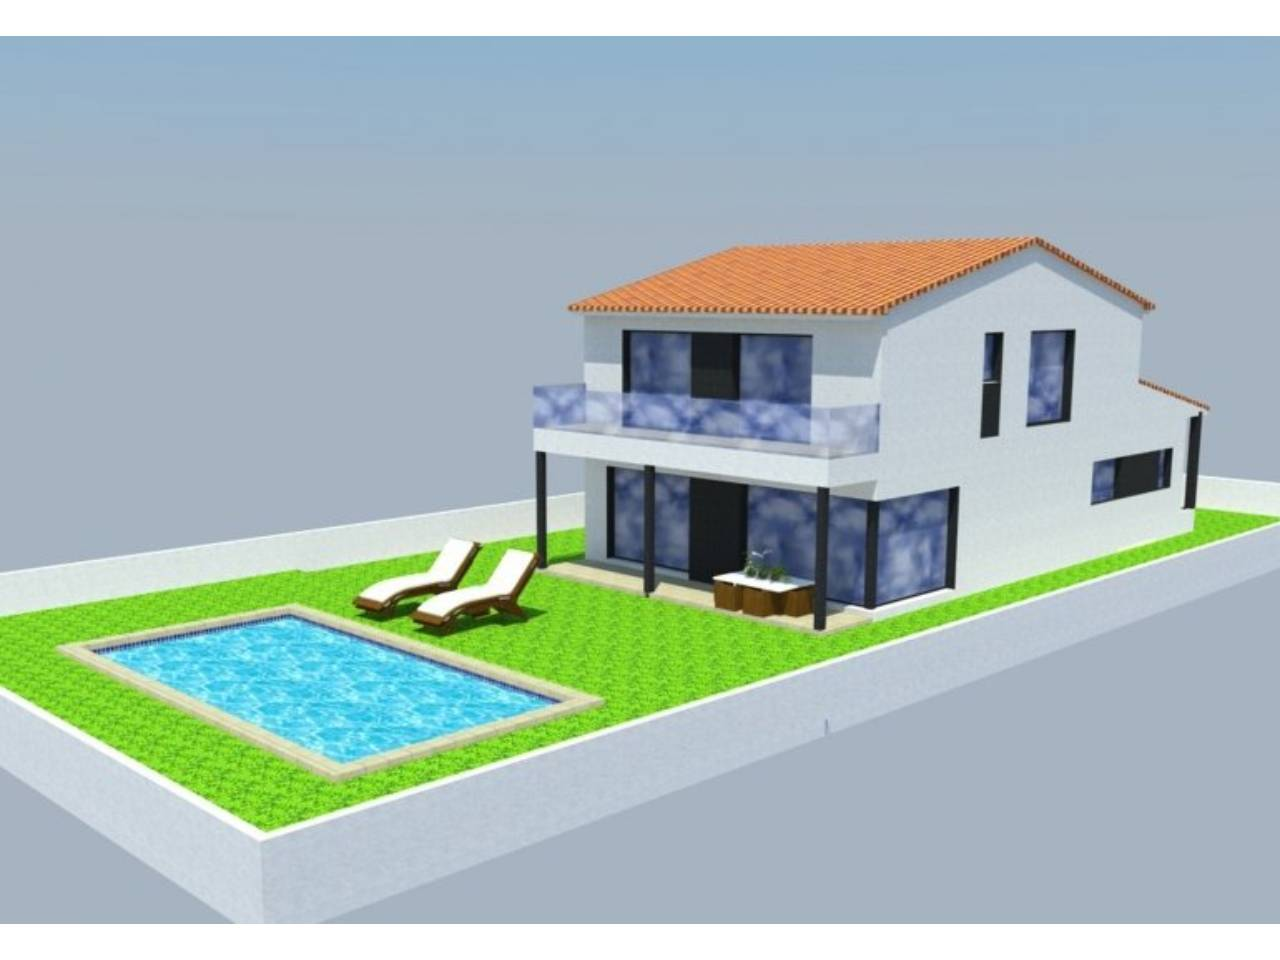 060346 - ROSES -LA GARRIGA House model RODA